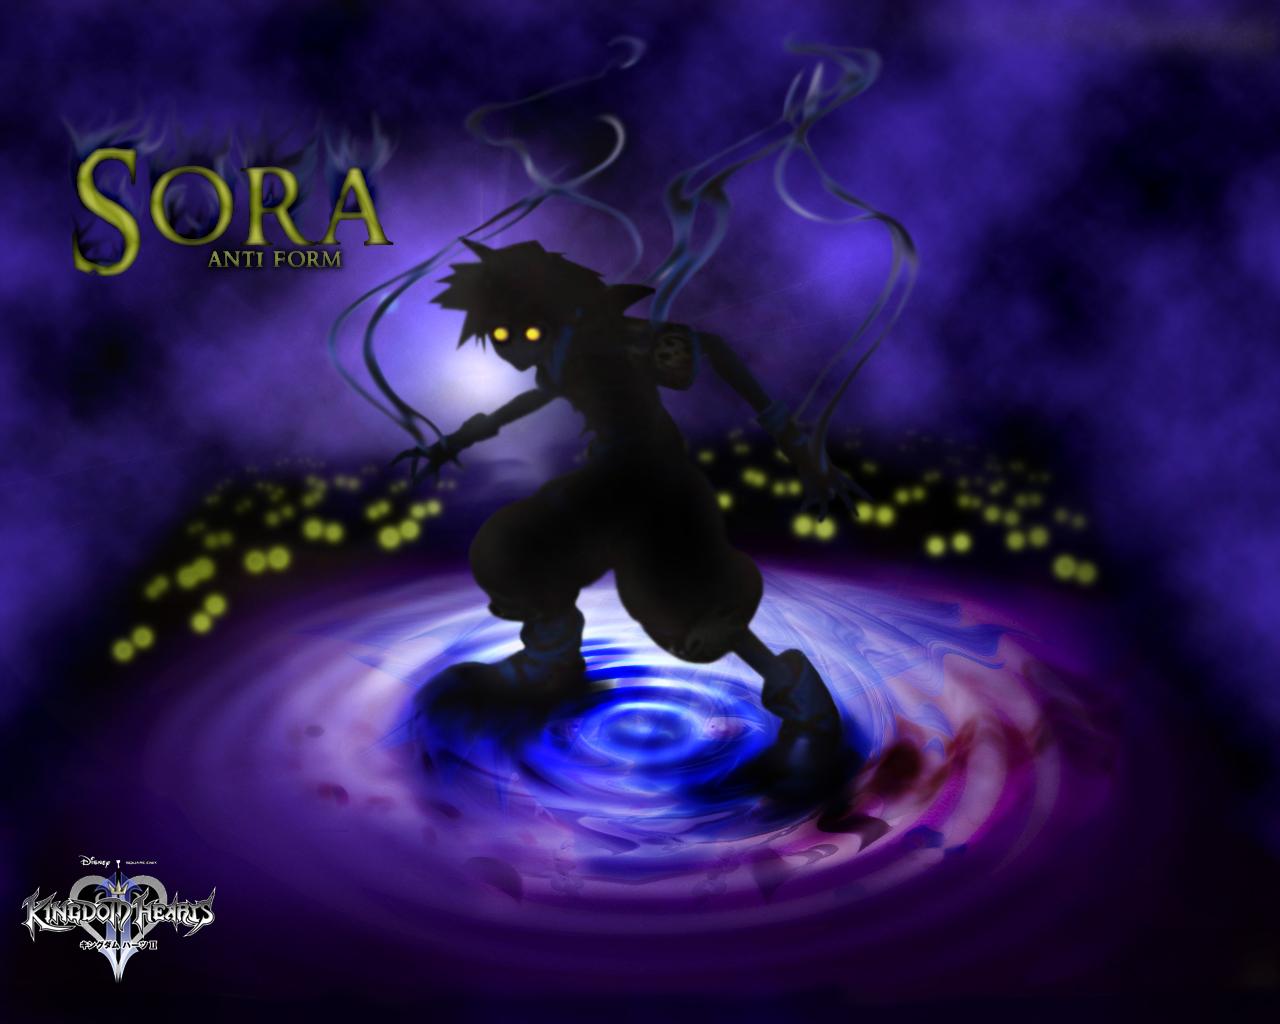 Kingdom Hearts Wallpaper Sora Anti Form Minitokyo